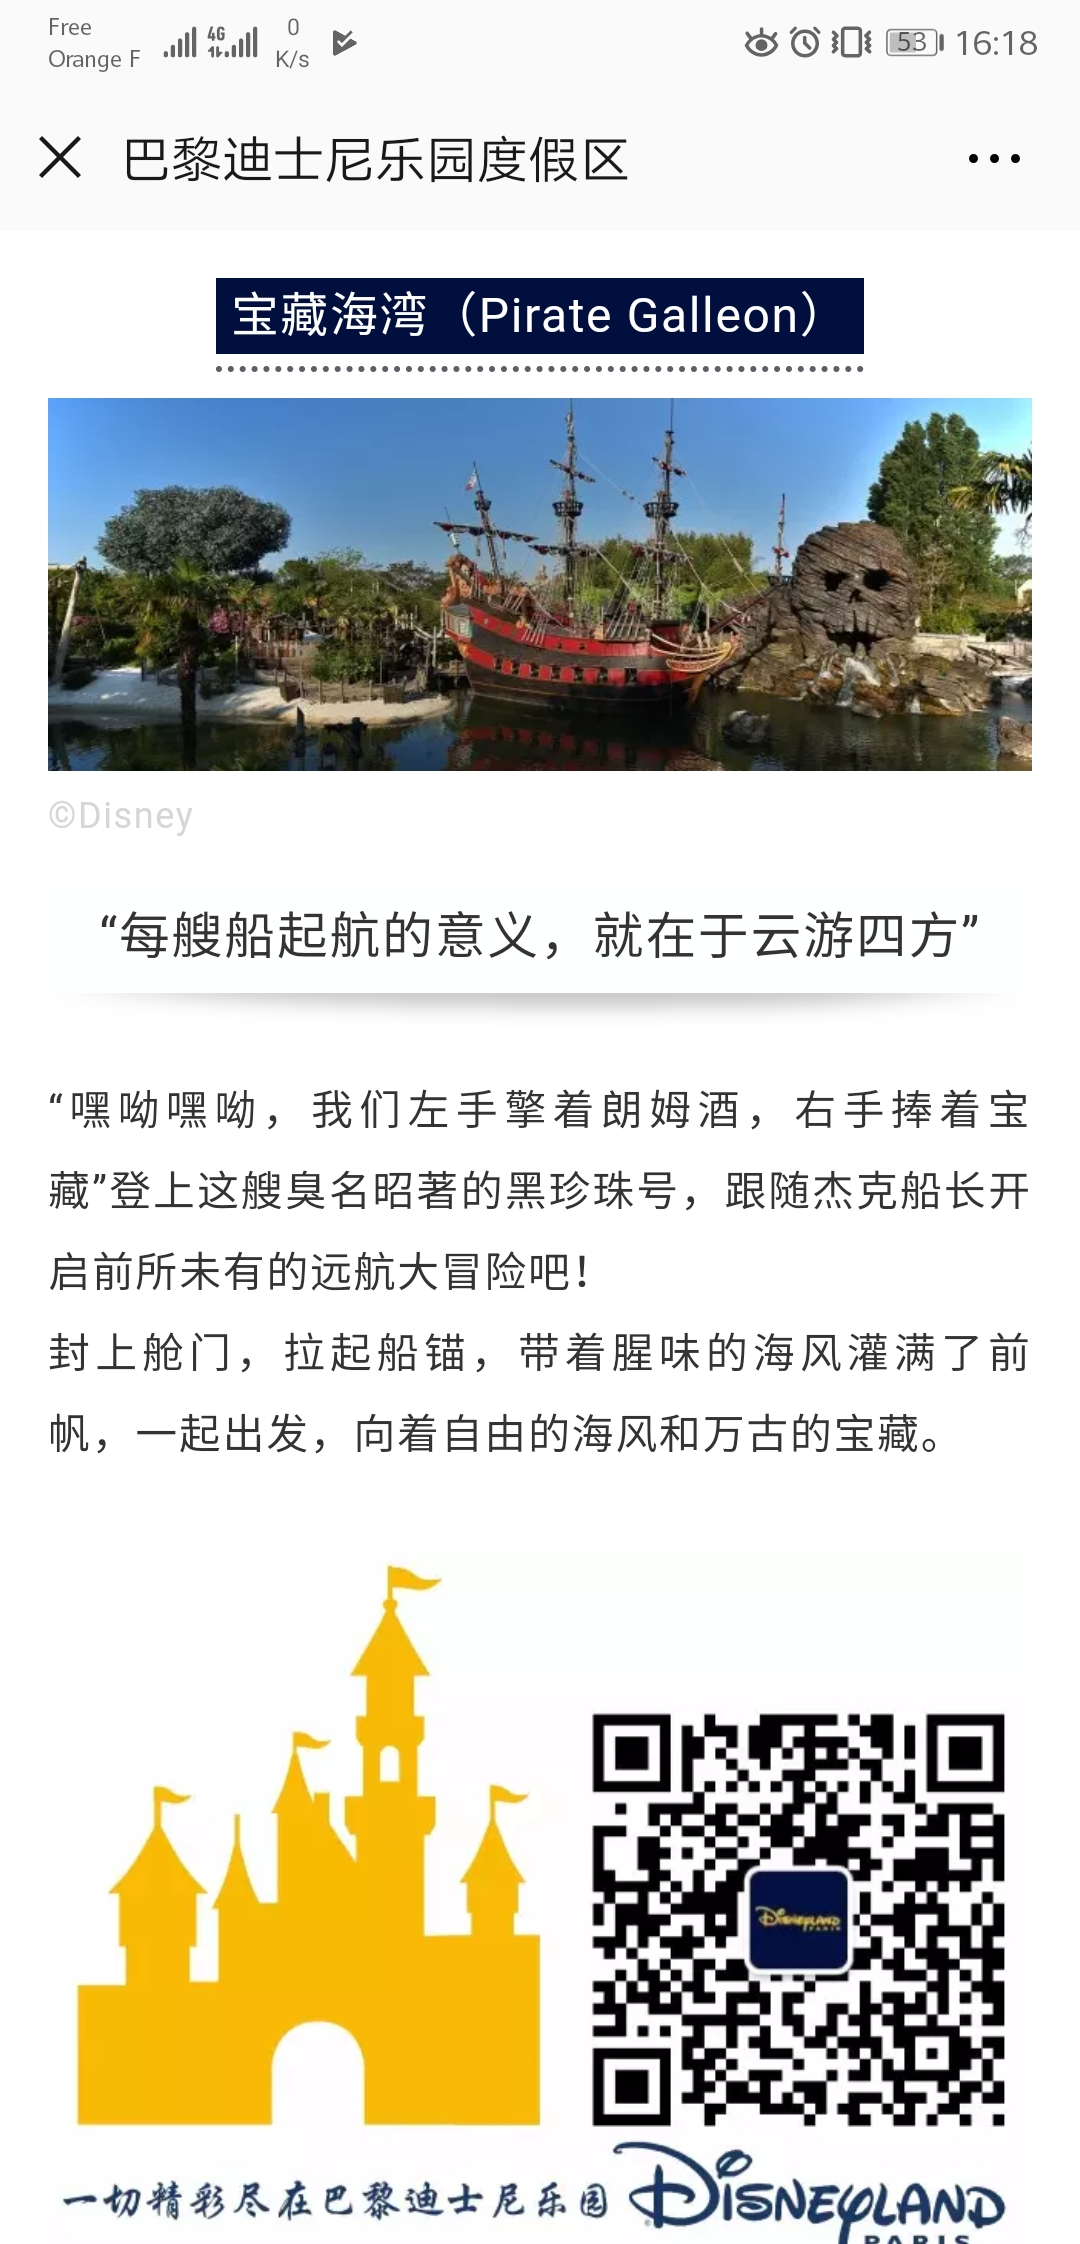 DISNEYLAND WeChat account